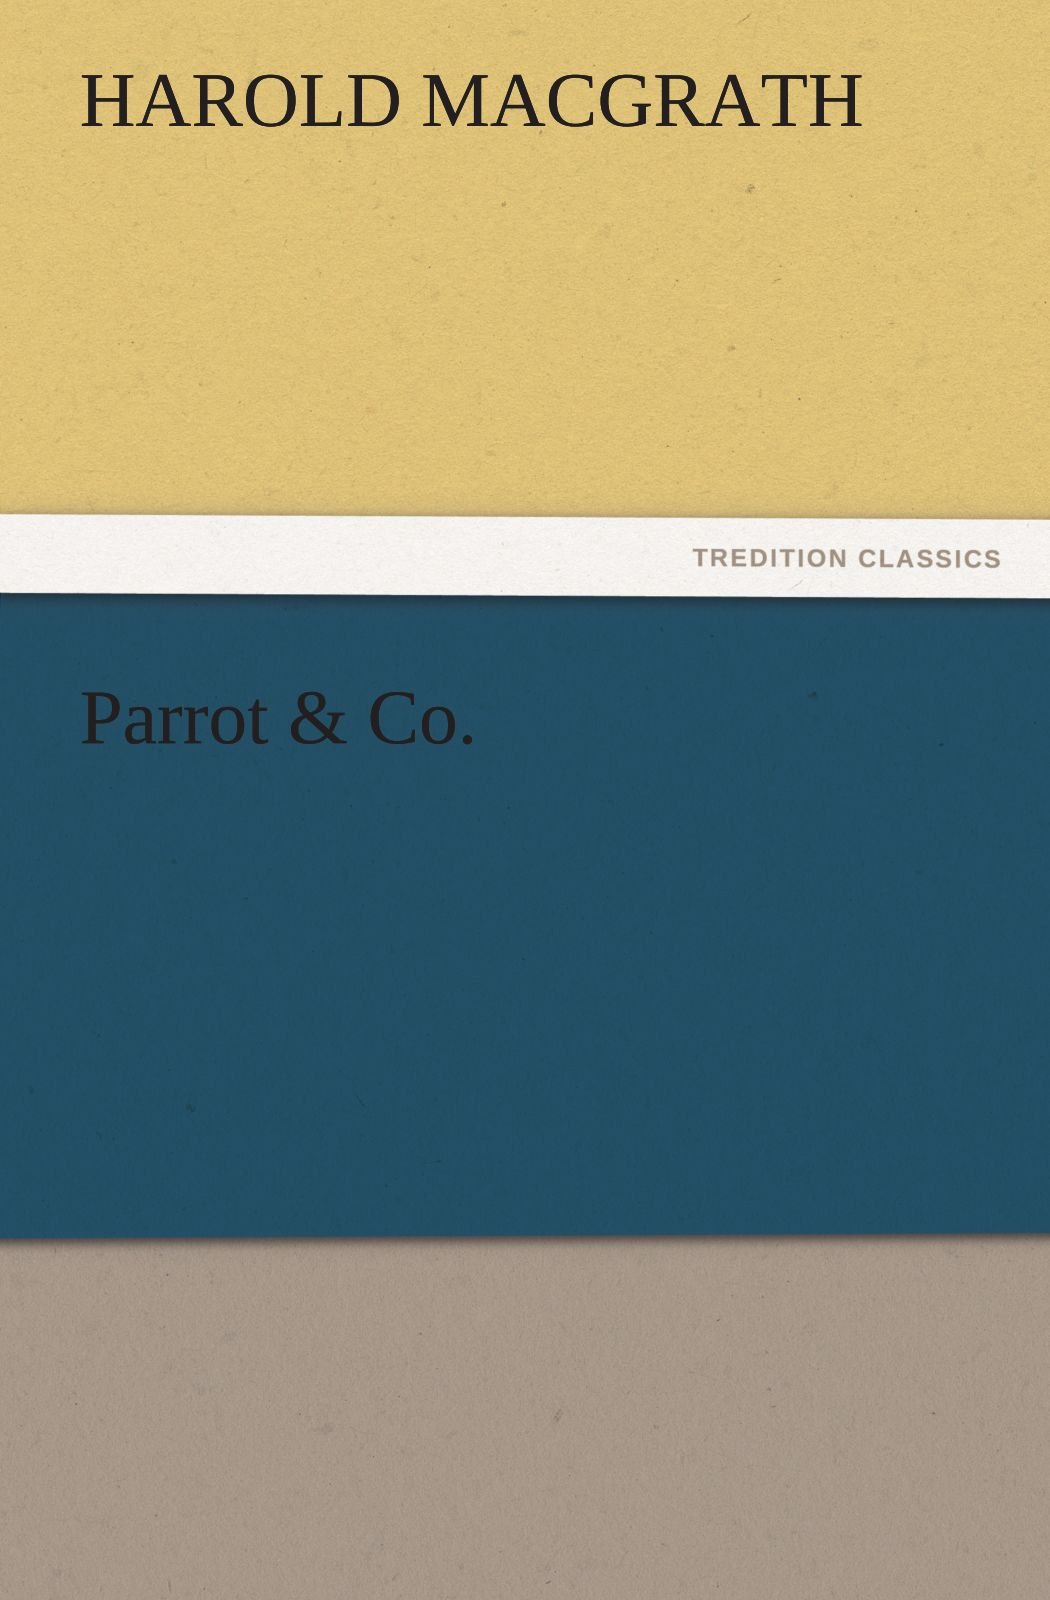 Read Online Parrot & Co. (TREDITION CLASSICS) PDF